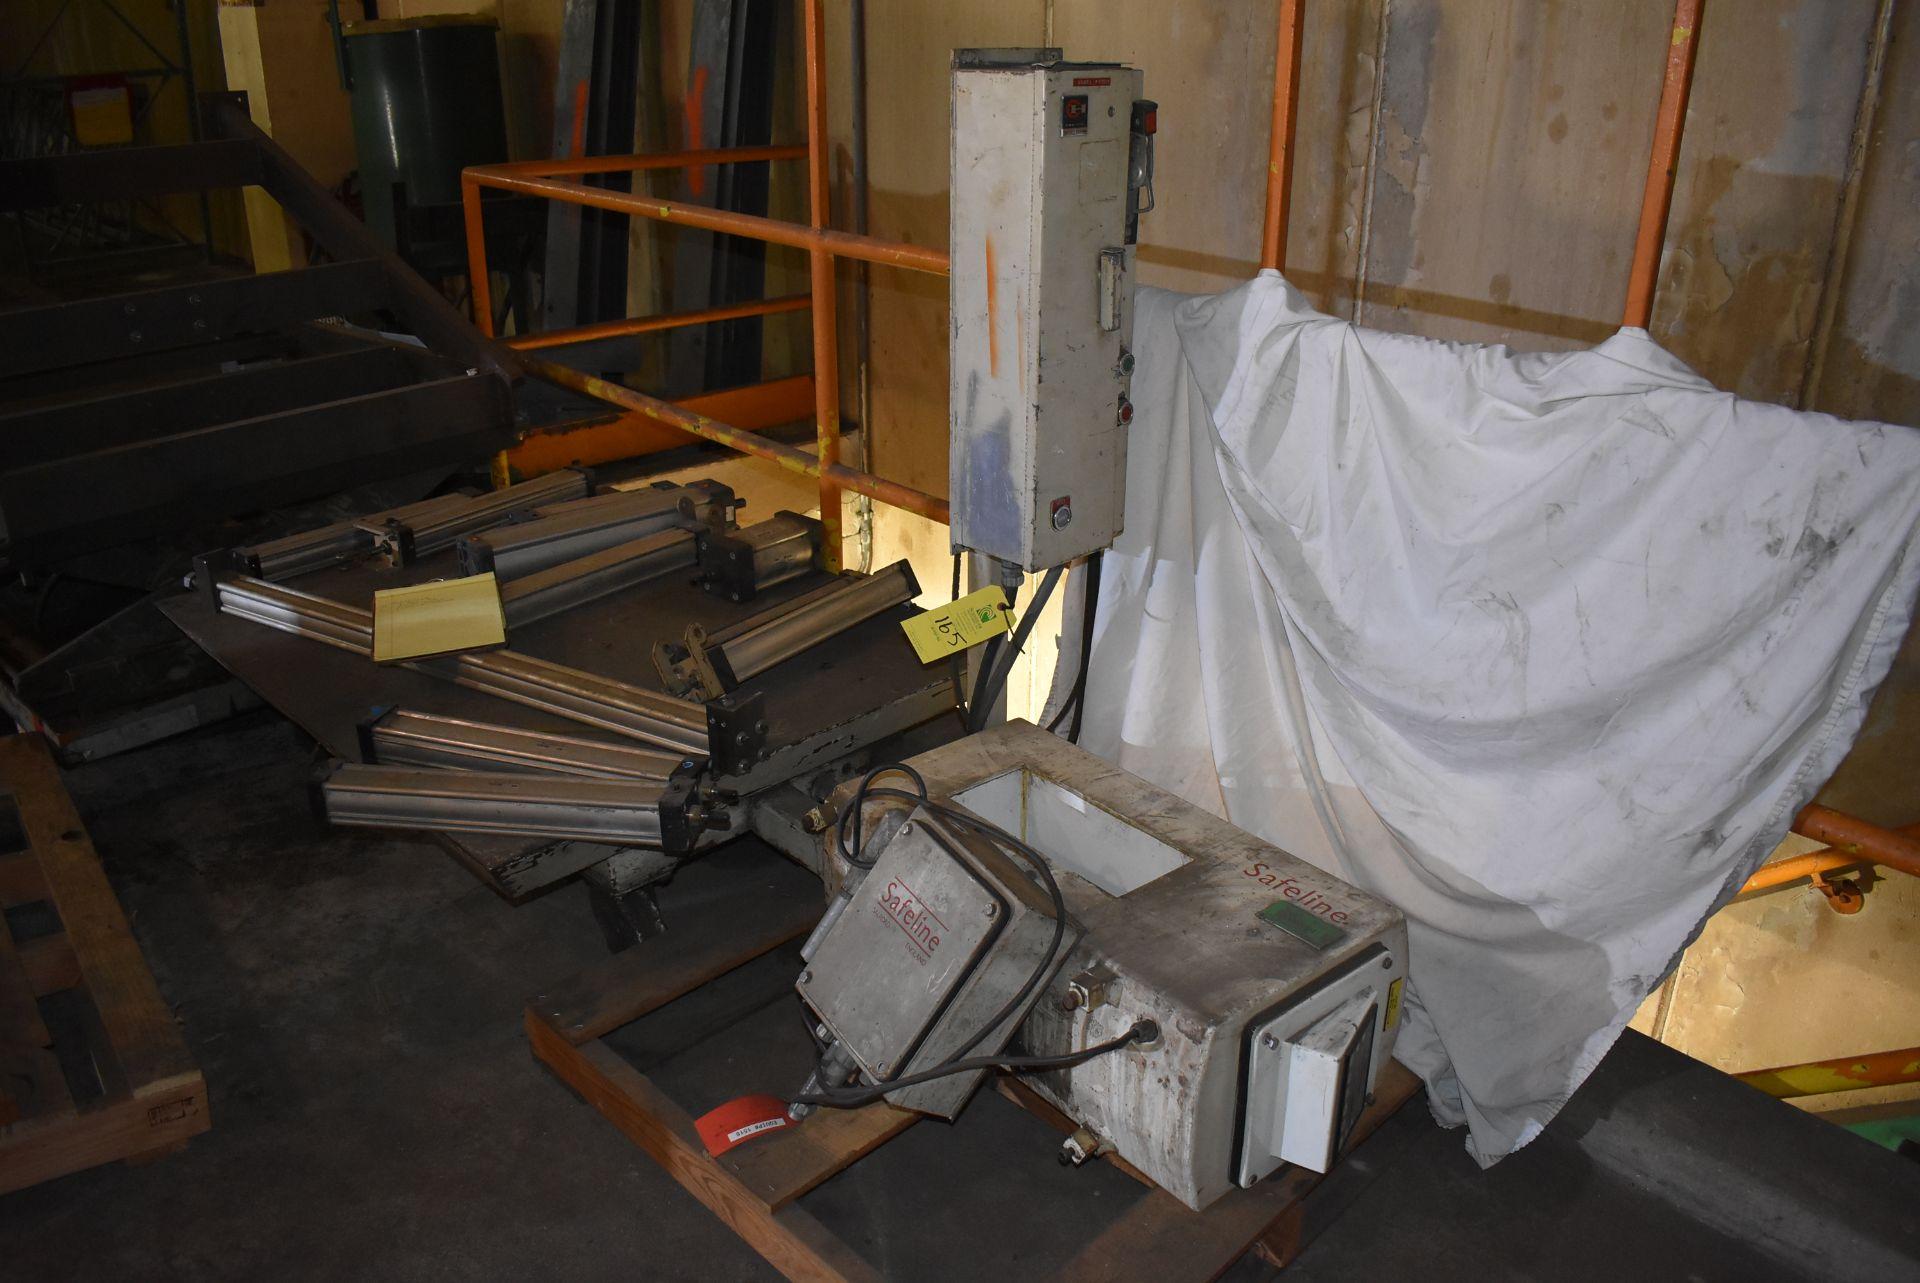 "Safeline Model #42 Metal Detector, 13 1/2"" x 6"" Aperture"